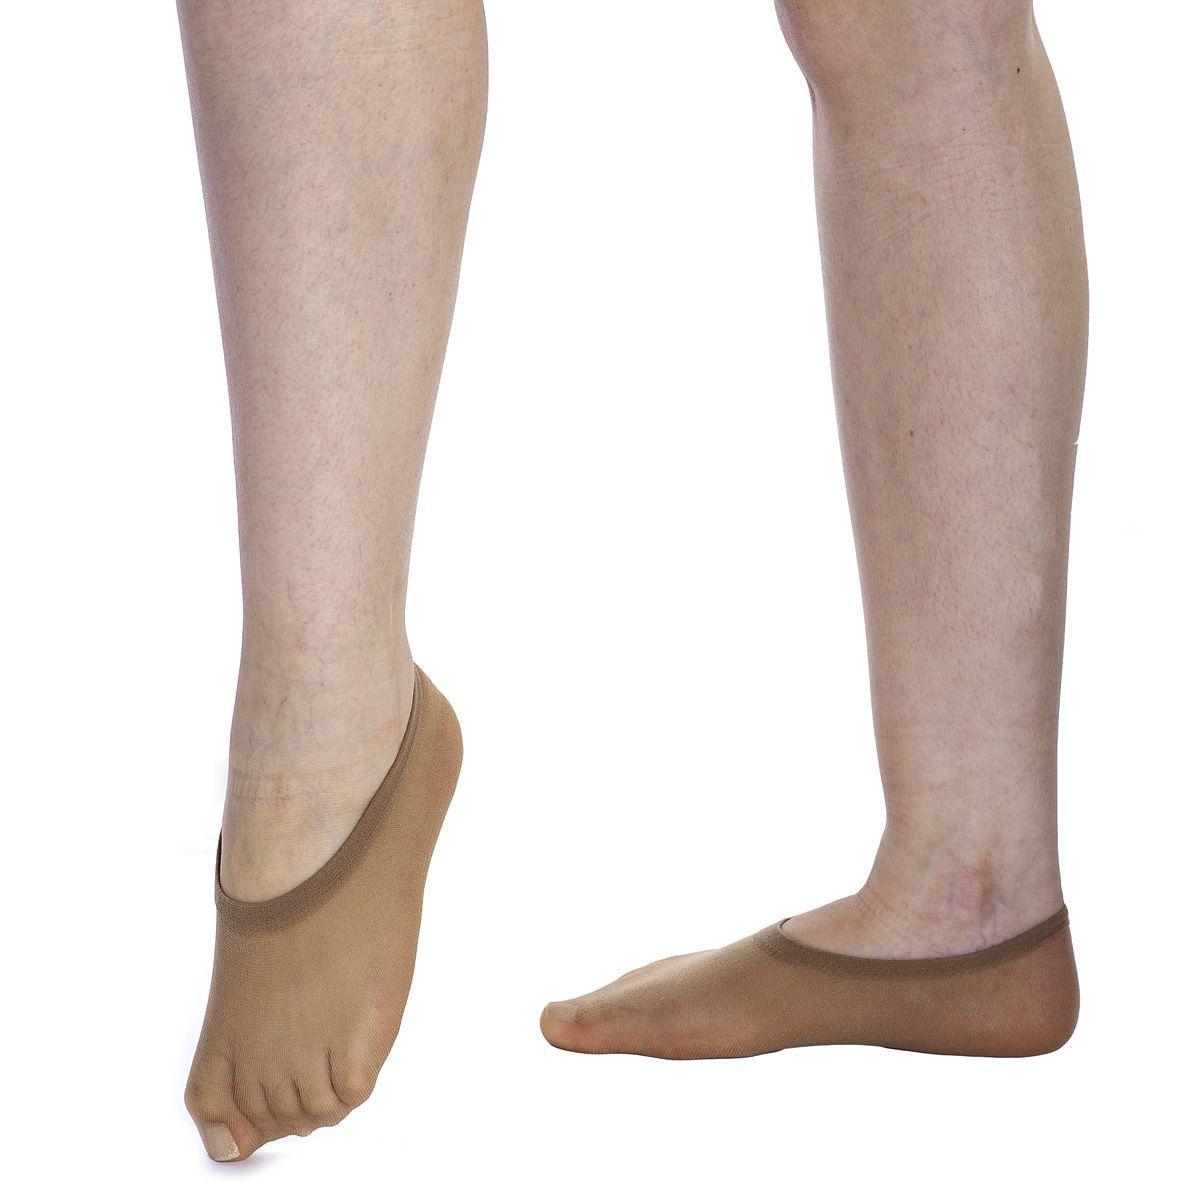 Kit 6 PARES meias sapatilha feminina soquete invisível fio 40  Loba Lupo